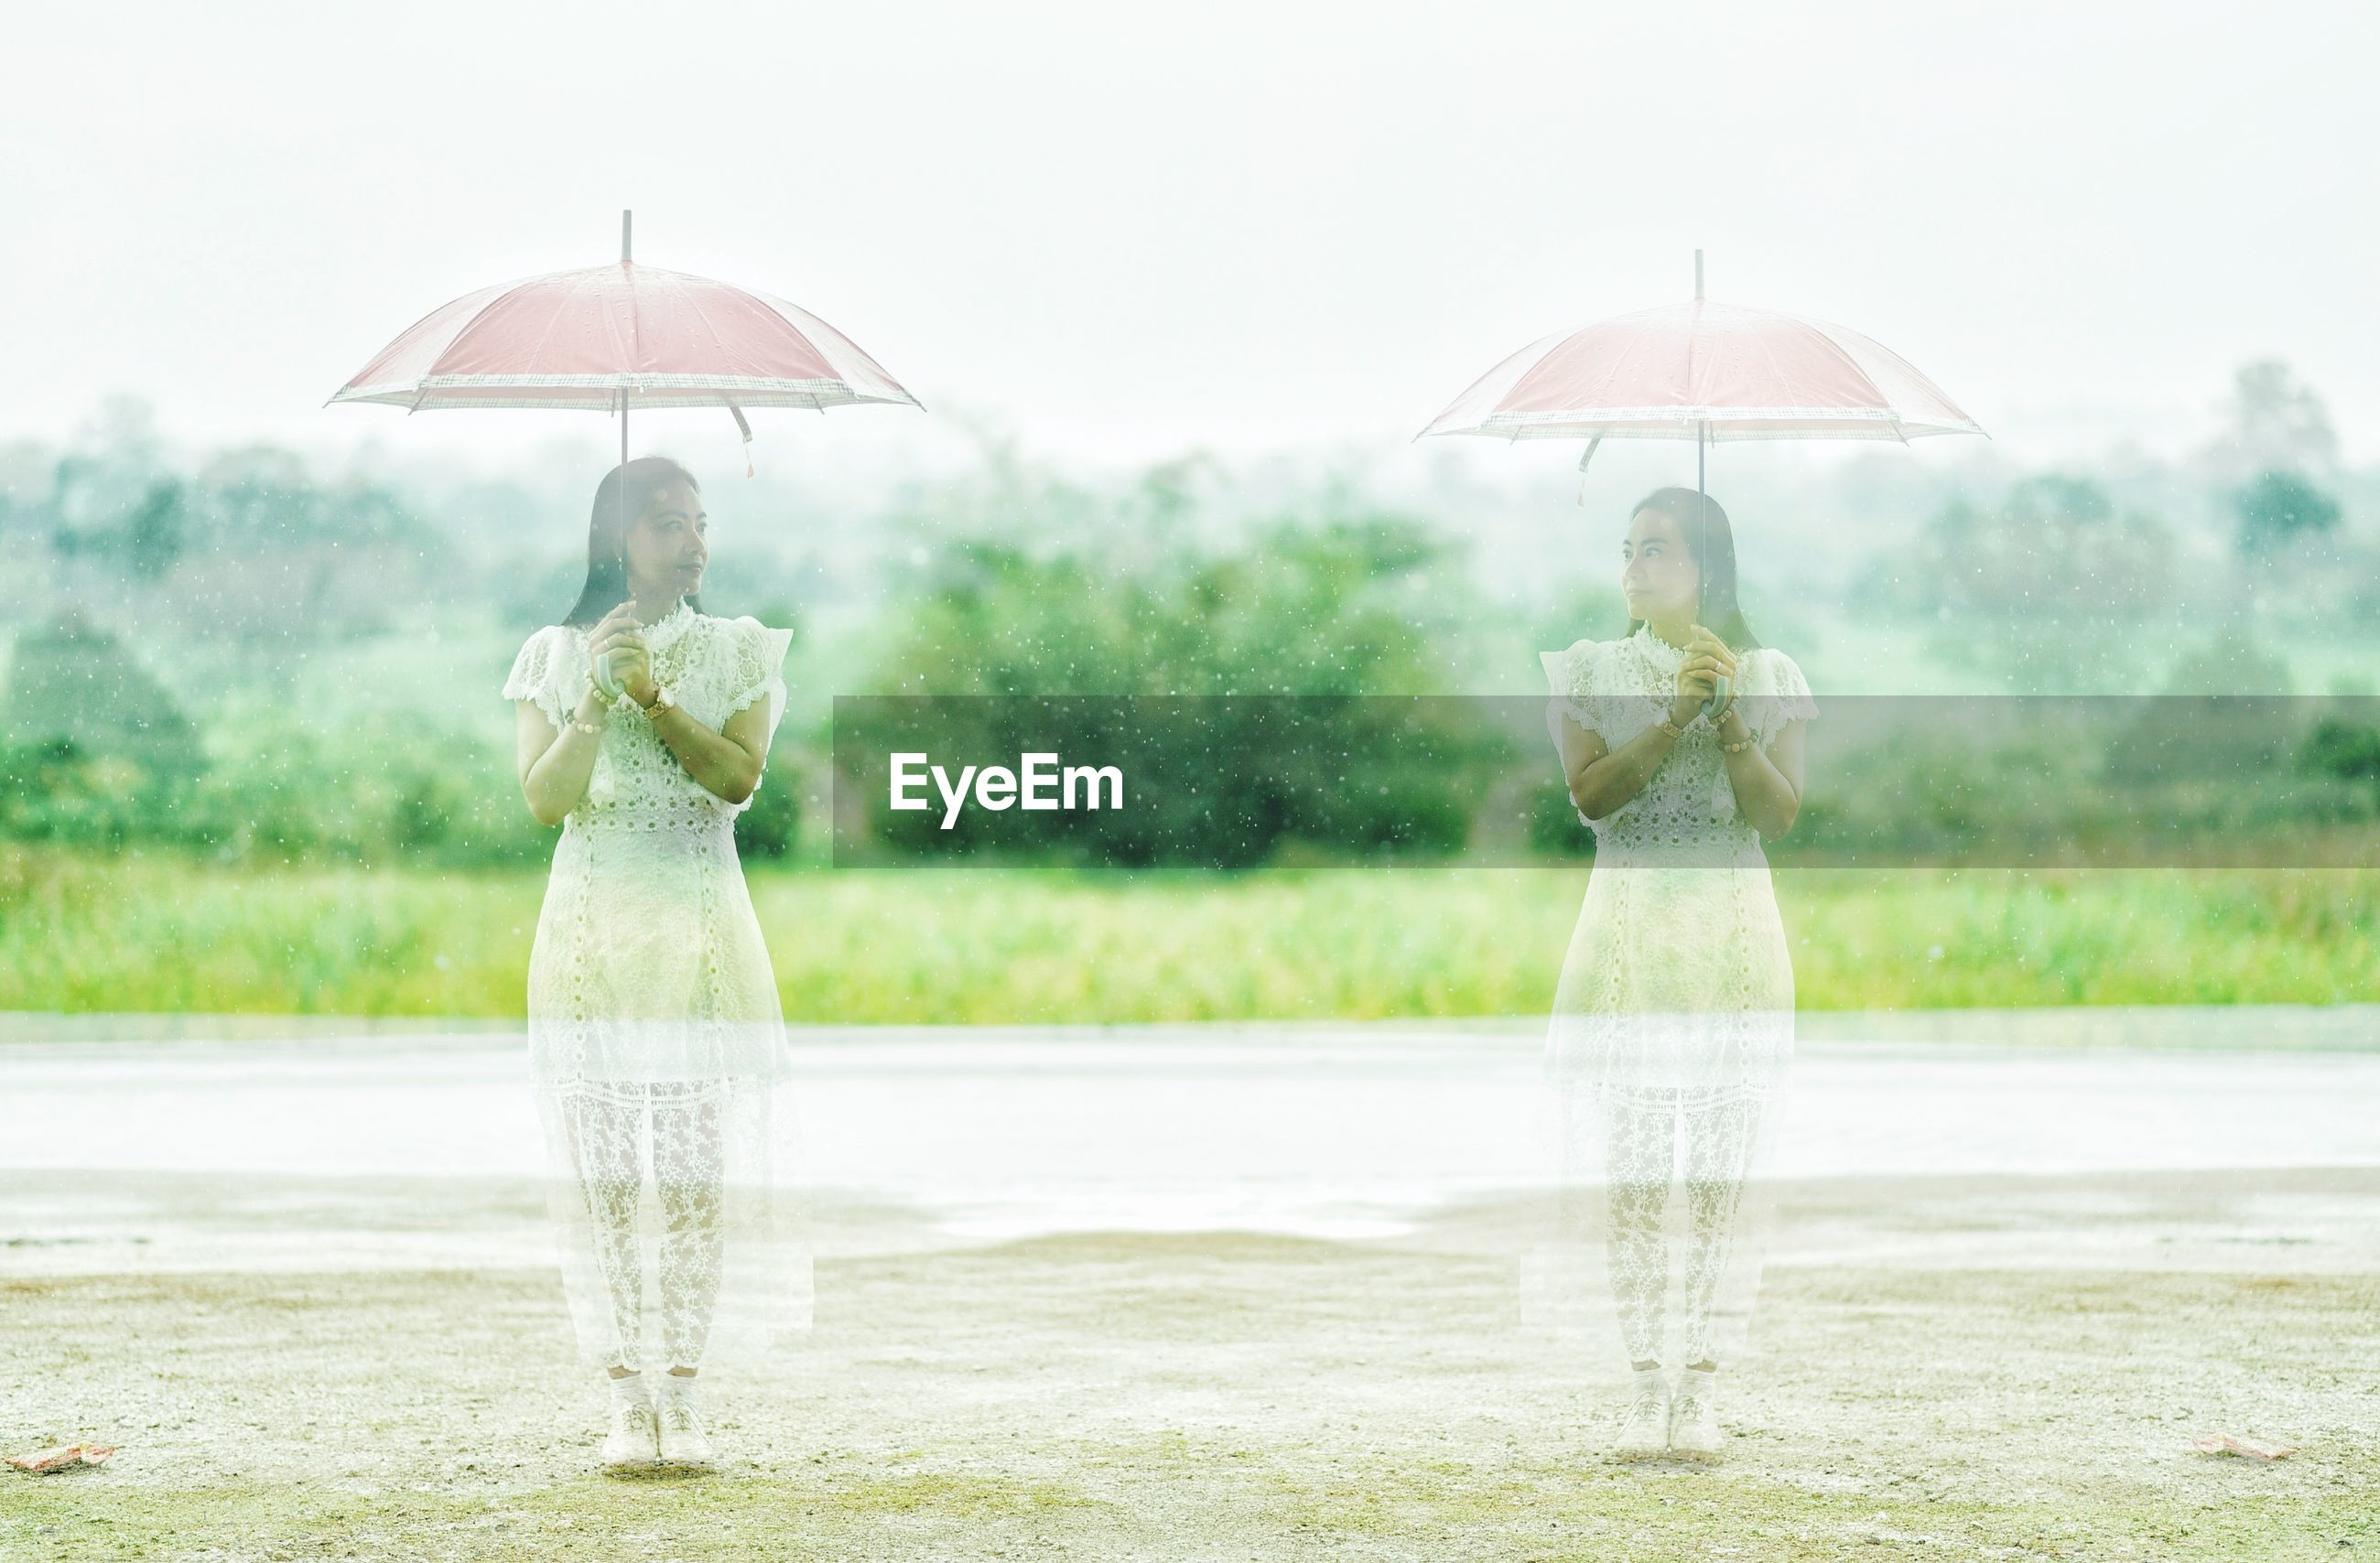 Double exposure of woman standing with umbrella in rain